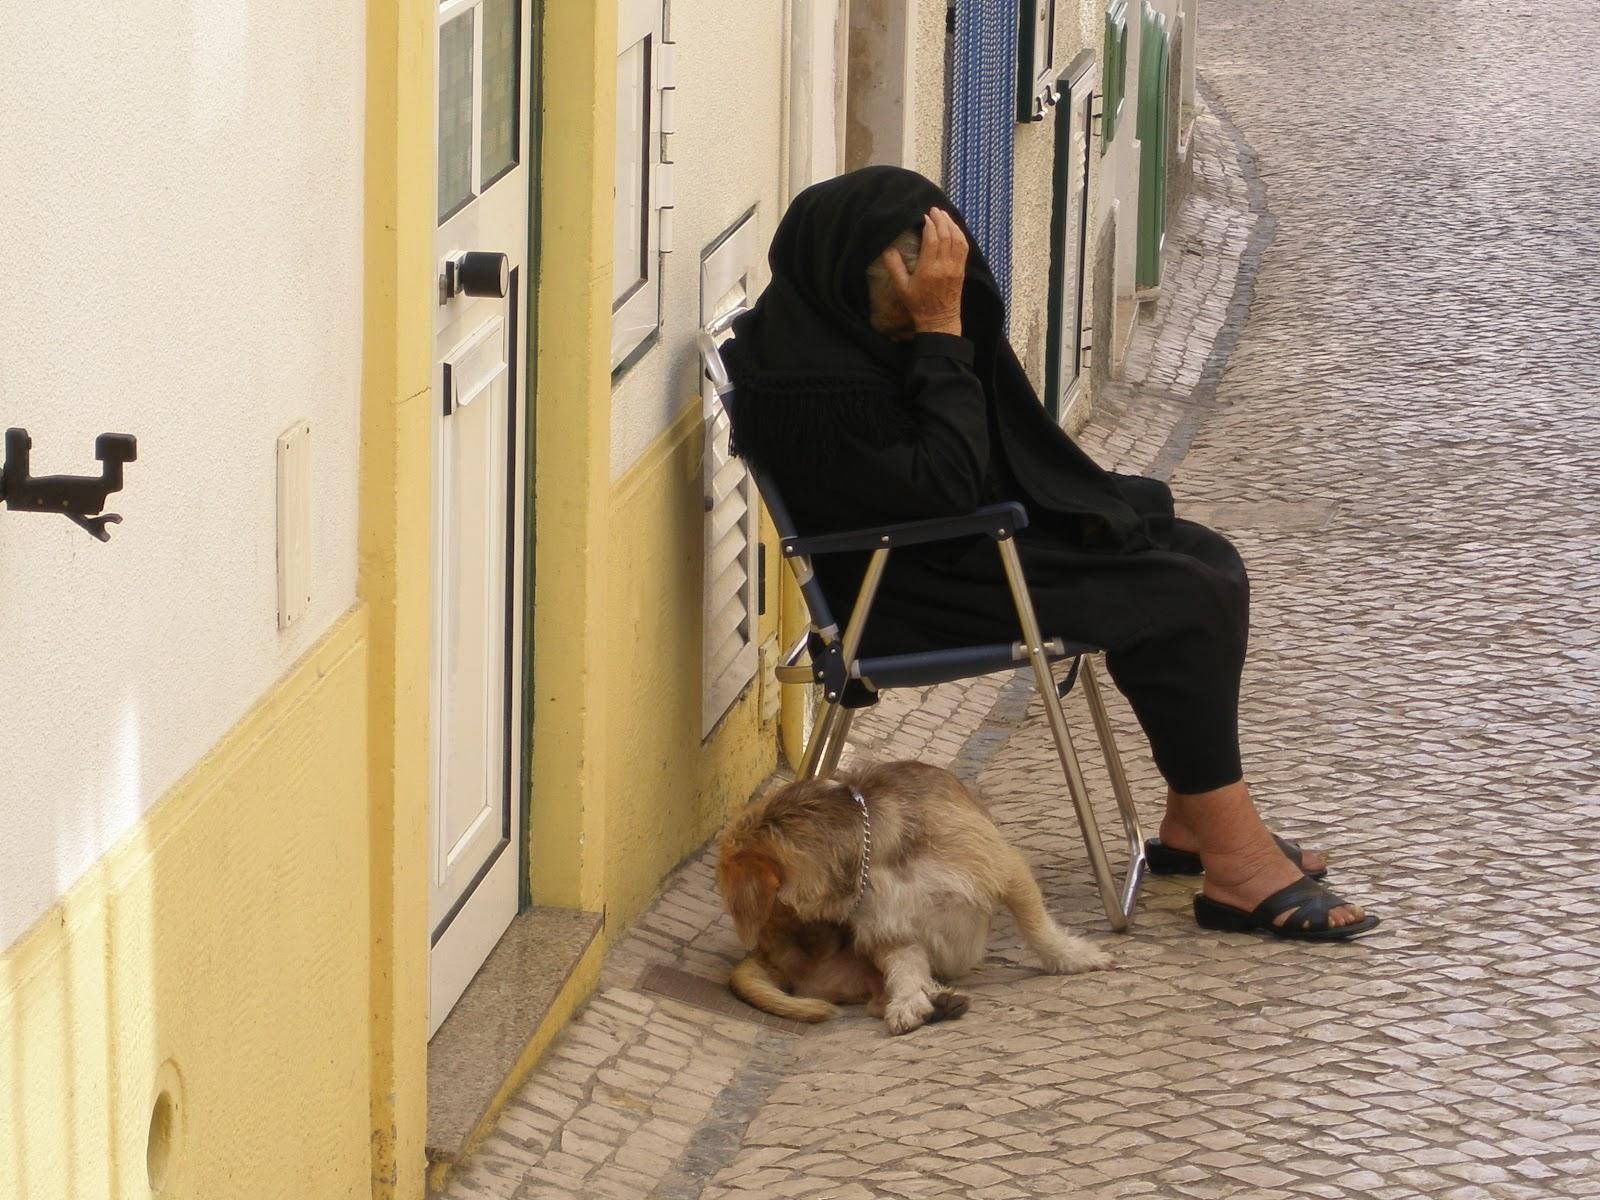 Alas ancianas de Tras-os-Montes y Beirainterior)